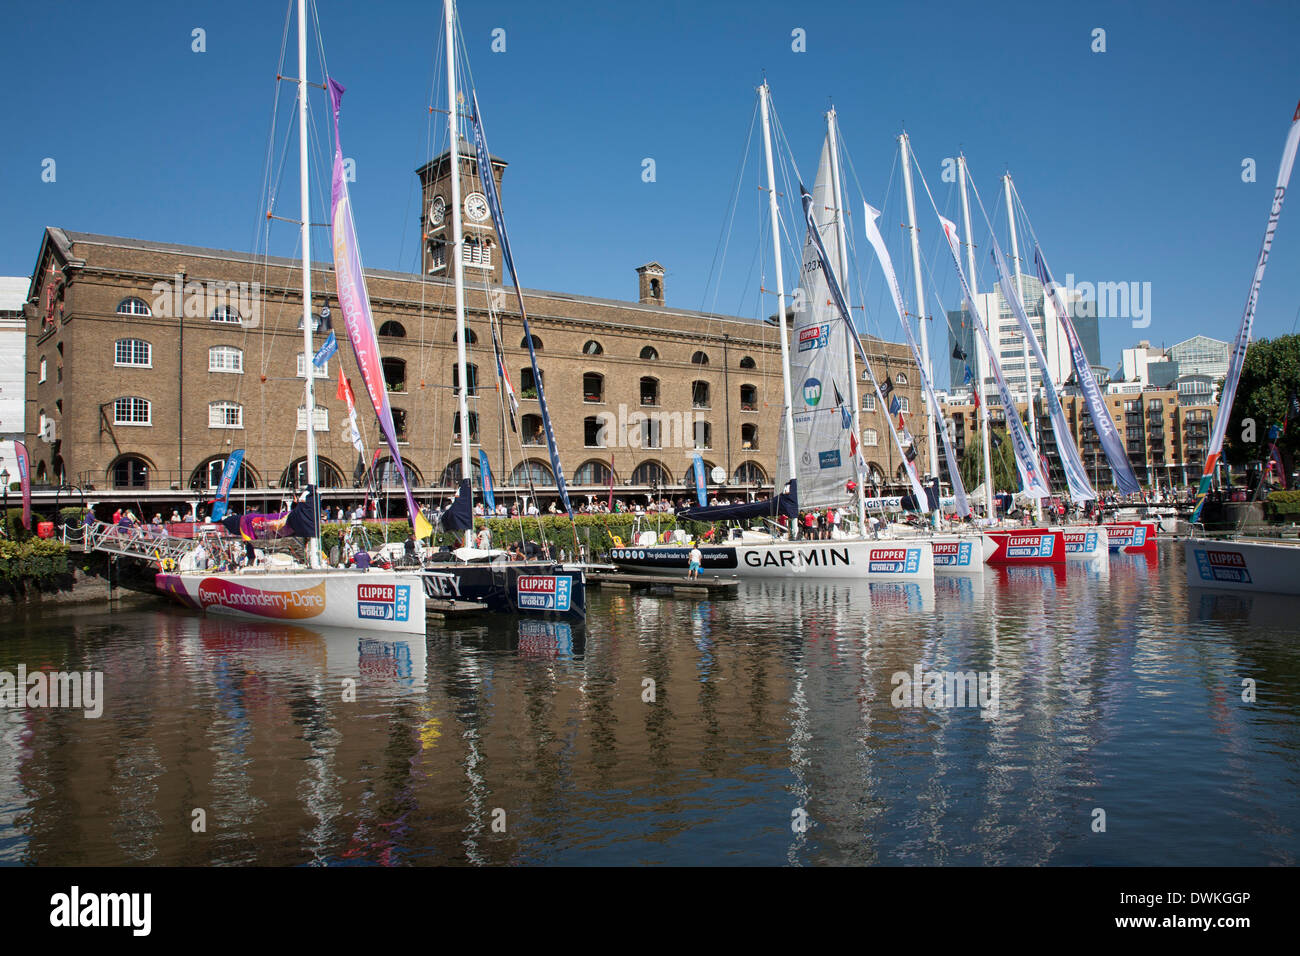 Clipper racing yachts docked at St. Katharine's Dock, London, England, United Kingdom, Europe - Stock Image